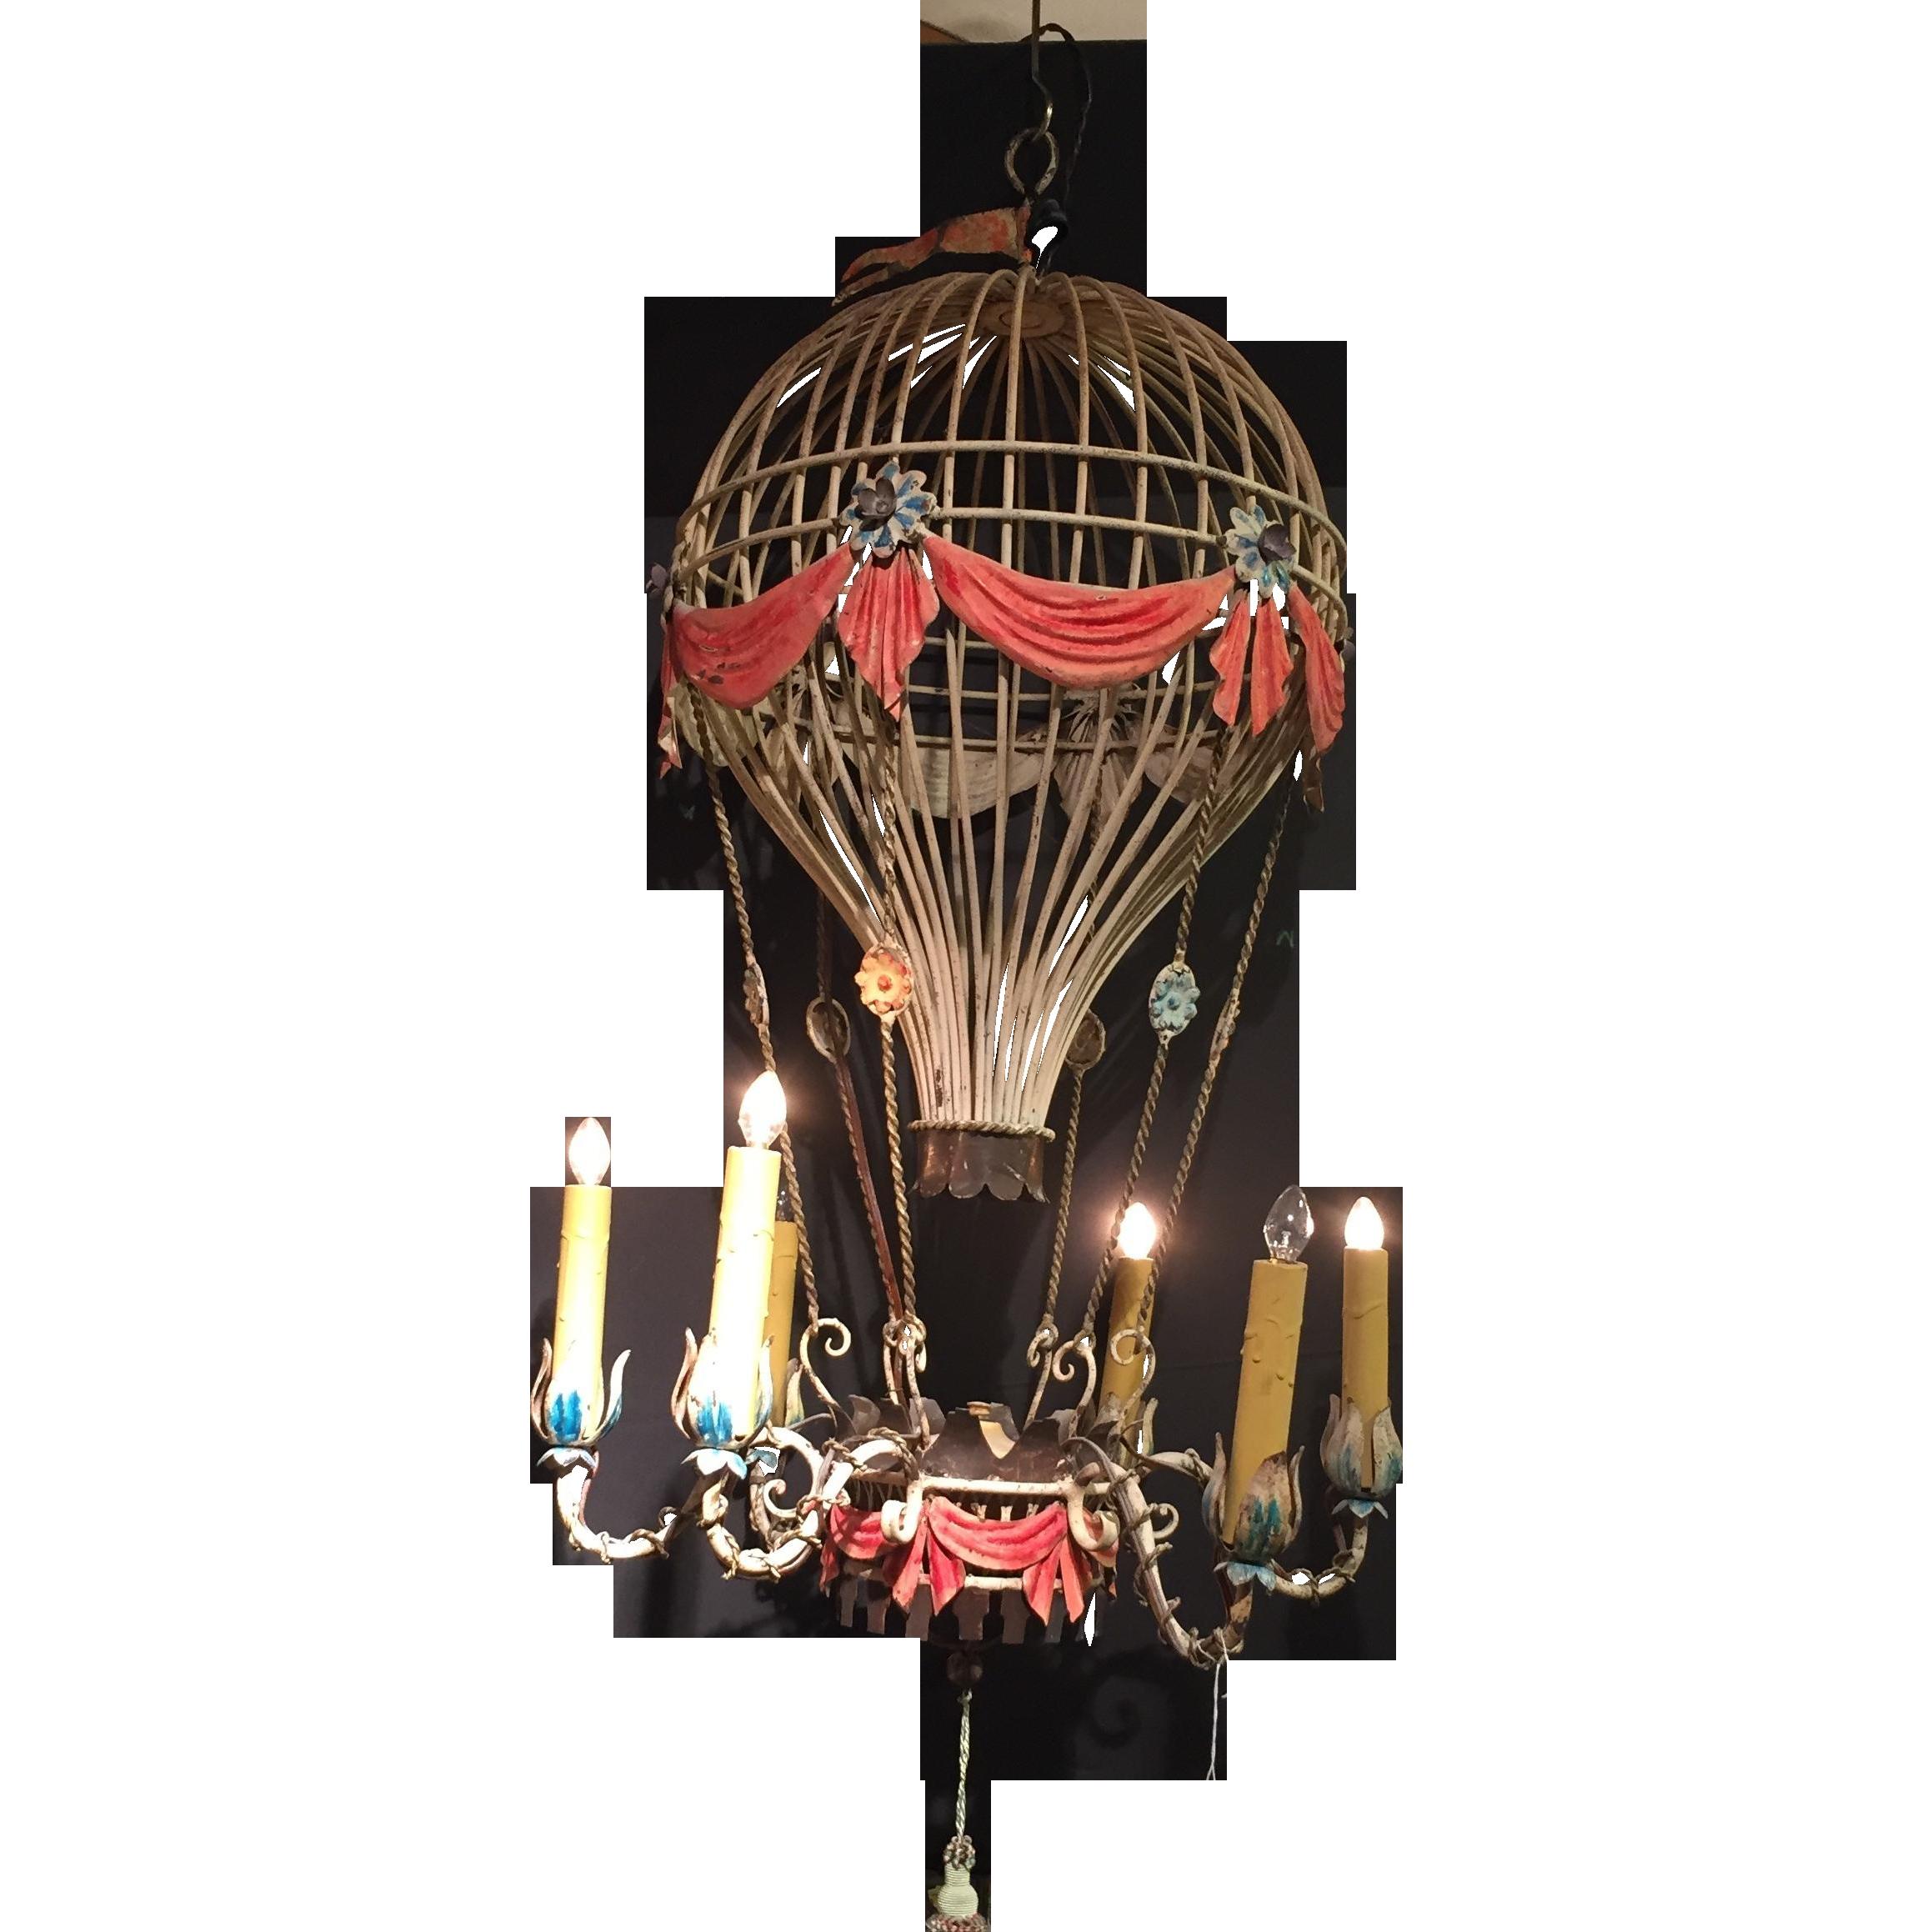 chrome lightroom unusual nd and balloon fixtures light chandelier minot gallery lighting presets design outdoor artistic air fixture designs hot